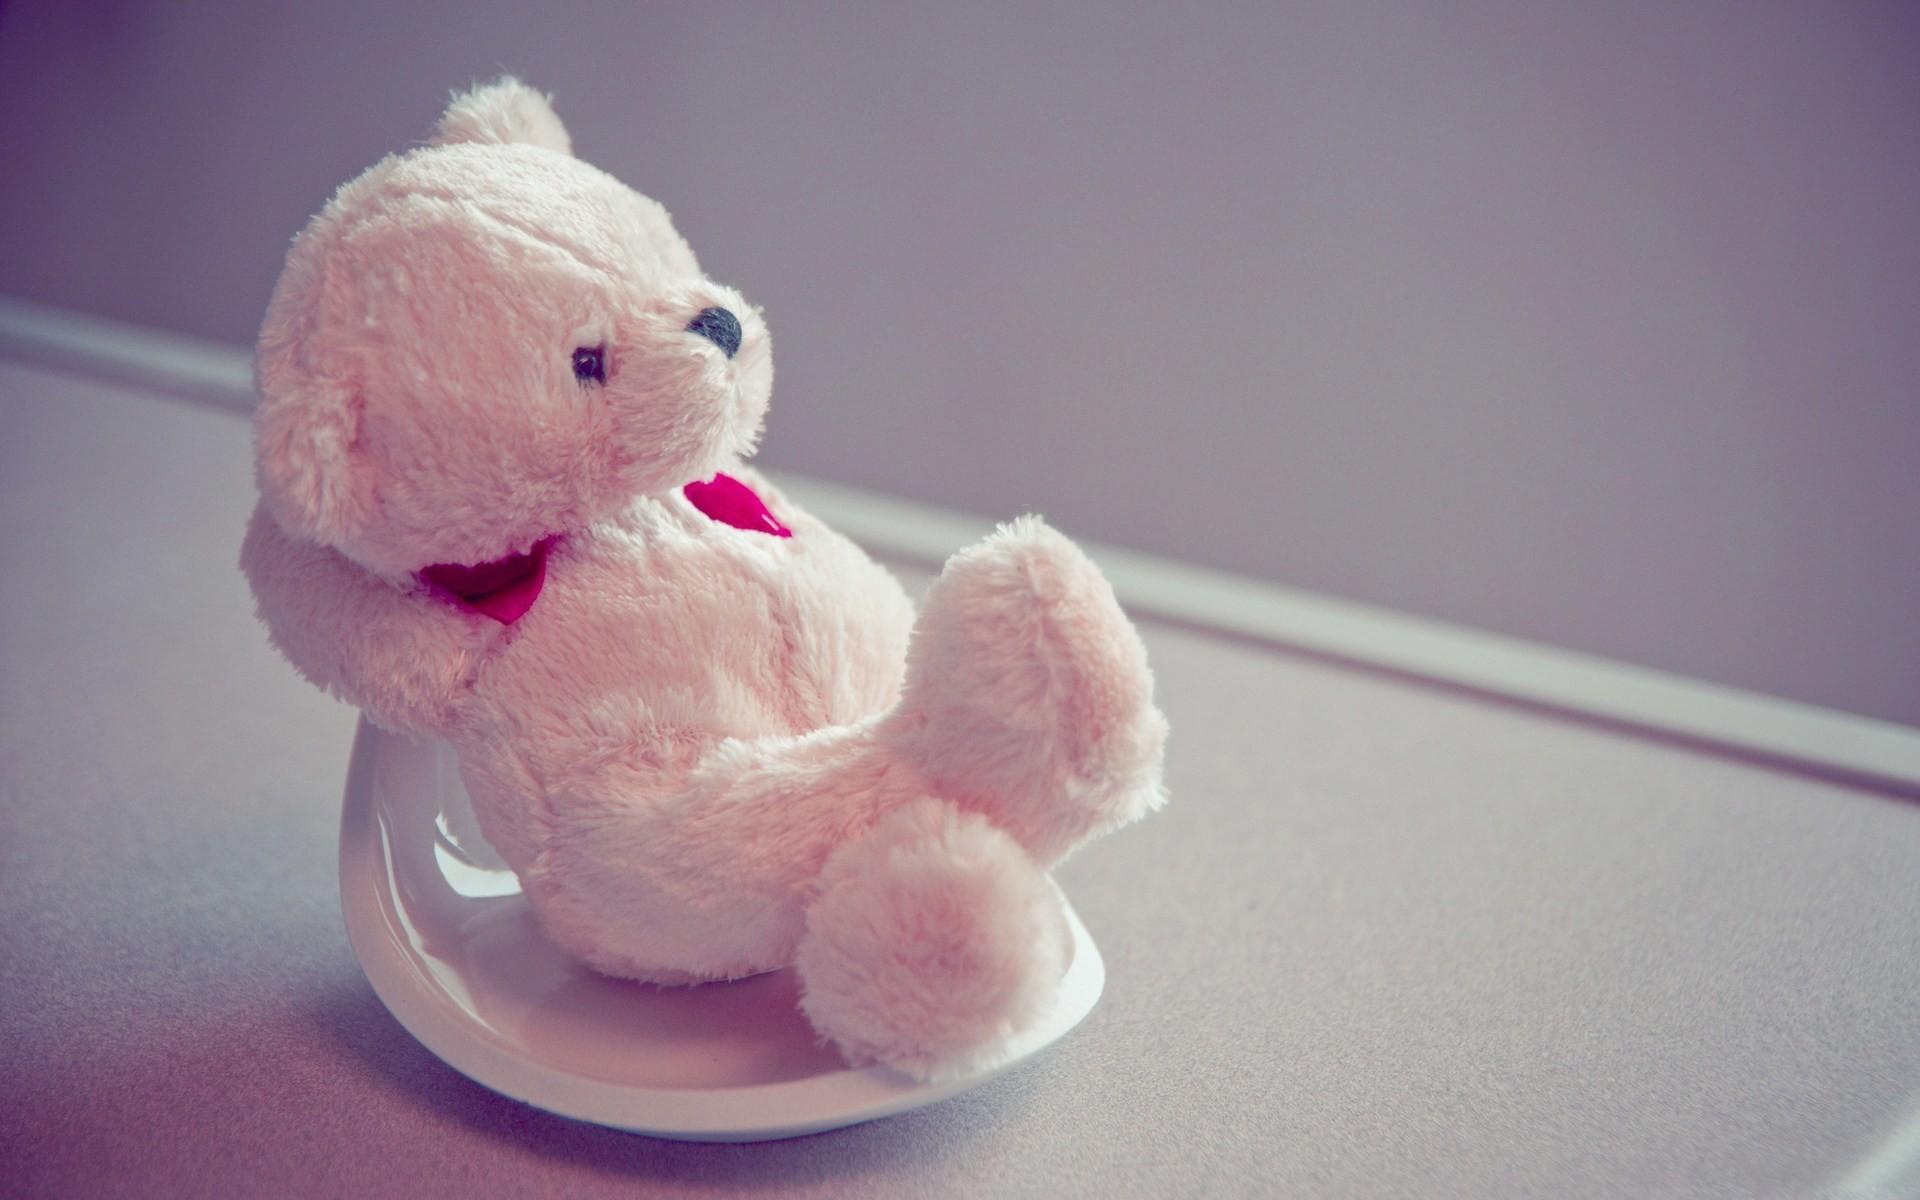 1920x1200 Beautiful Cute Teddy Bear HD Wallpapers Download